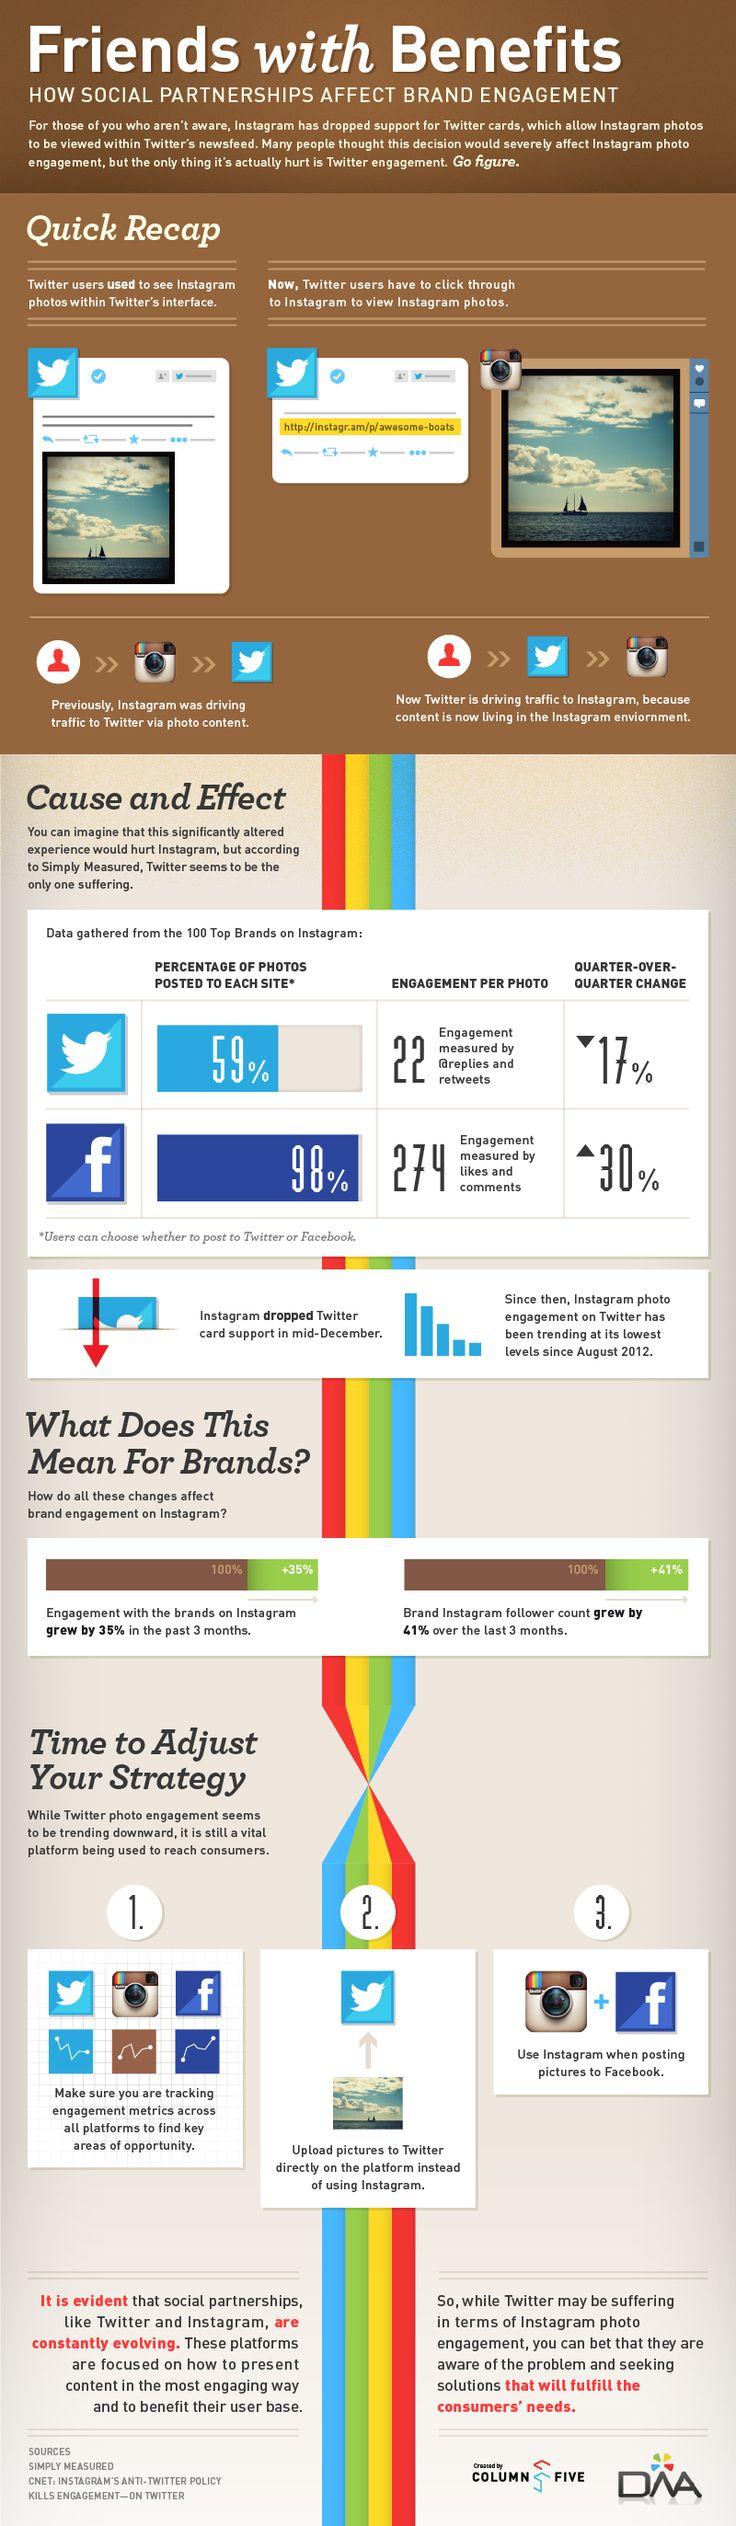 Twitter vs. Instagram: The Showdown in an Infographic. how social partnersips affect brand engagement